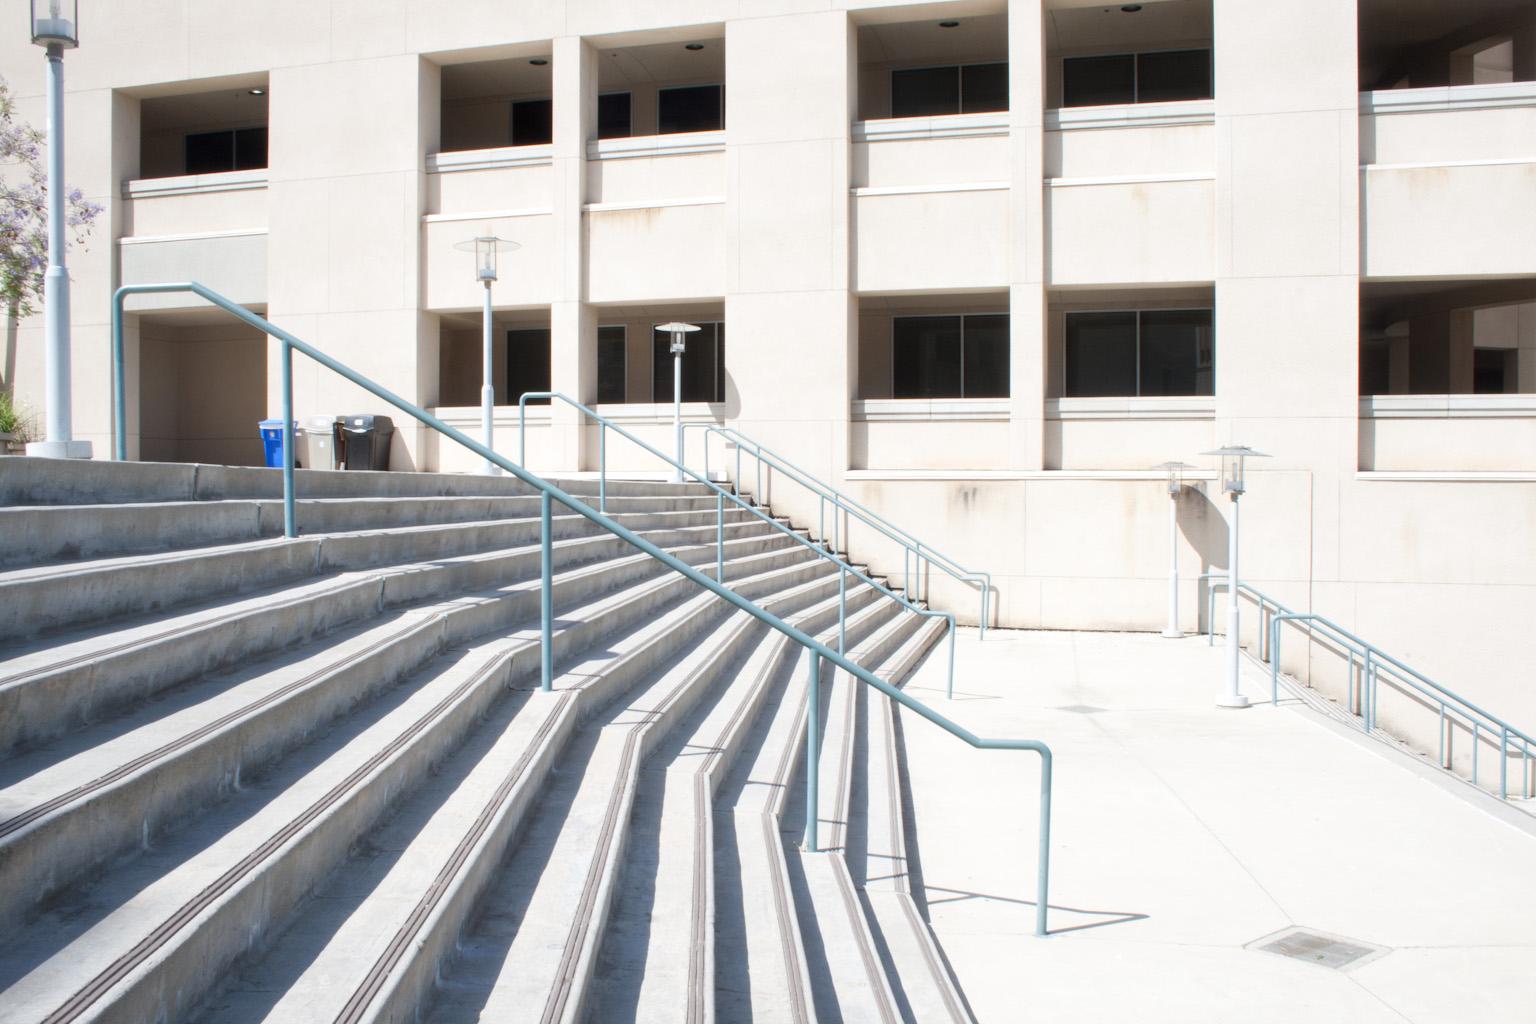 CSUSM Stairs bracket +2